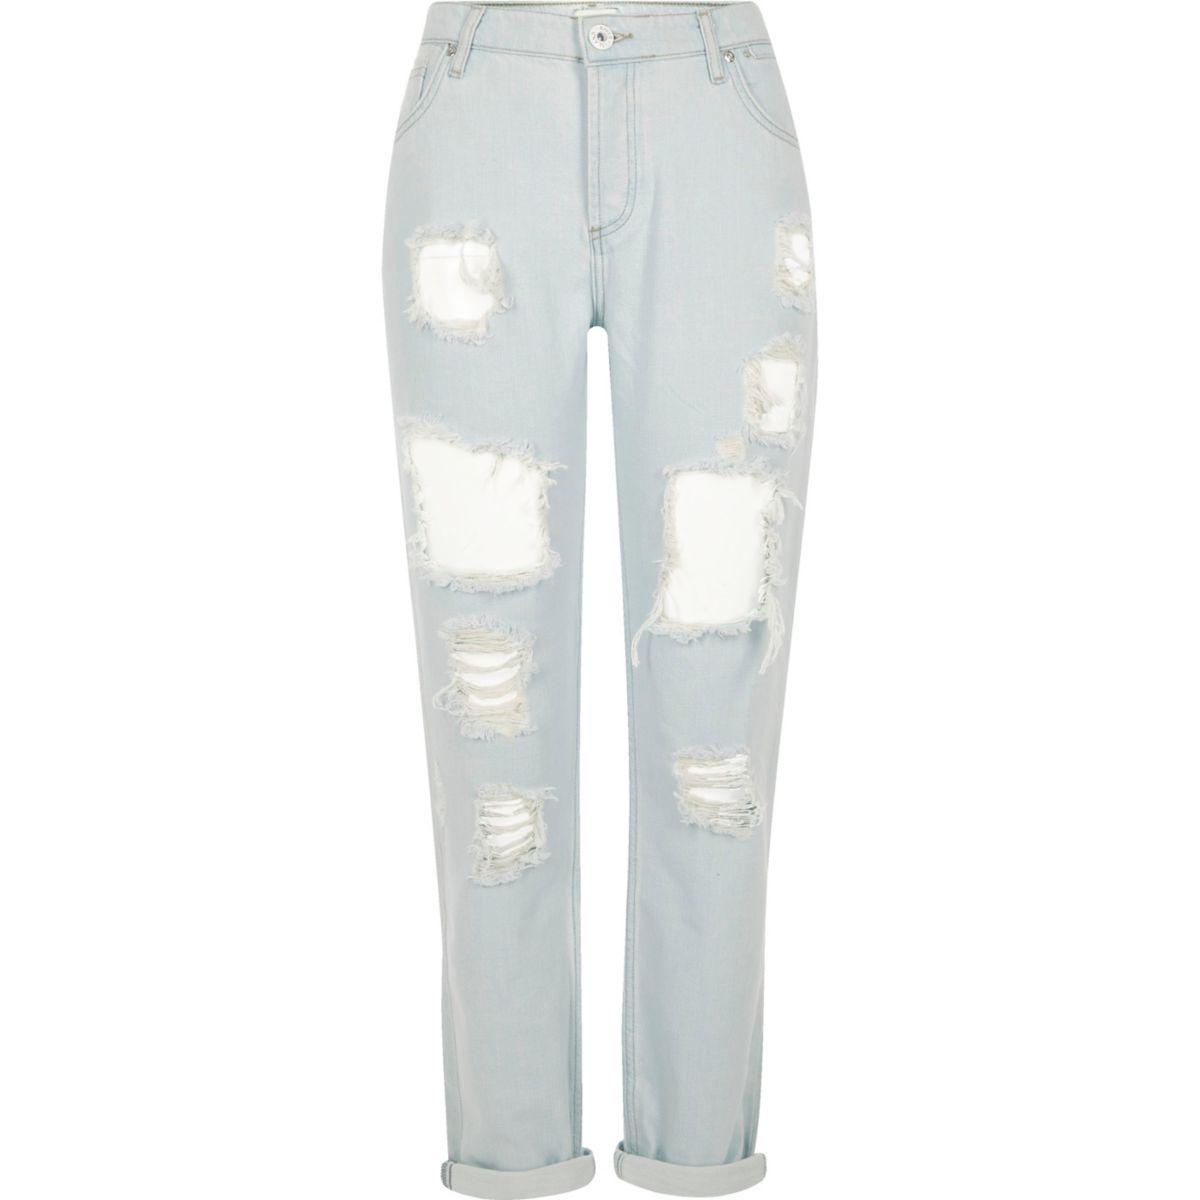 Light blue bleached ripped boyfriend jeans